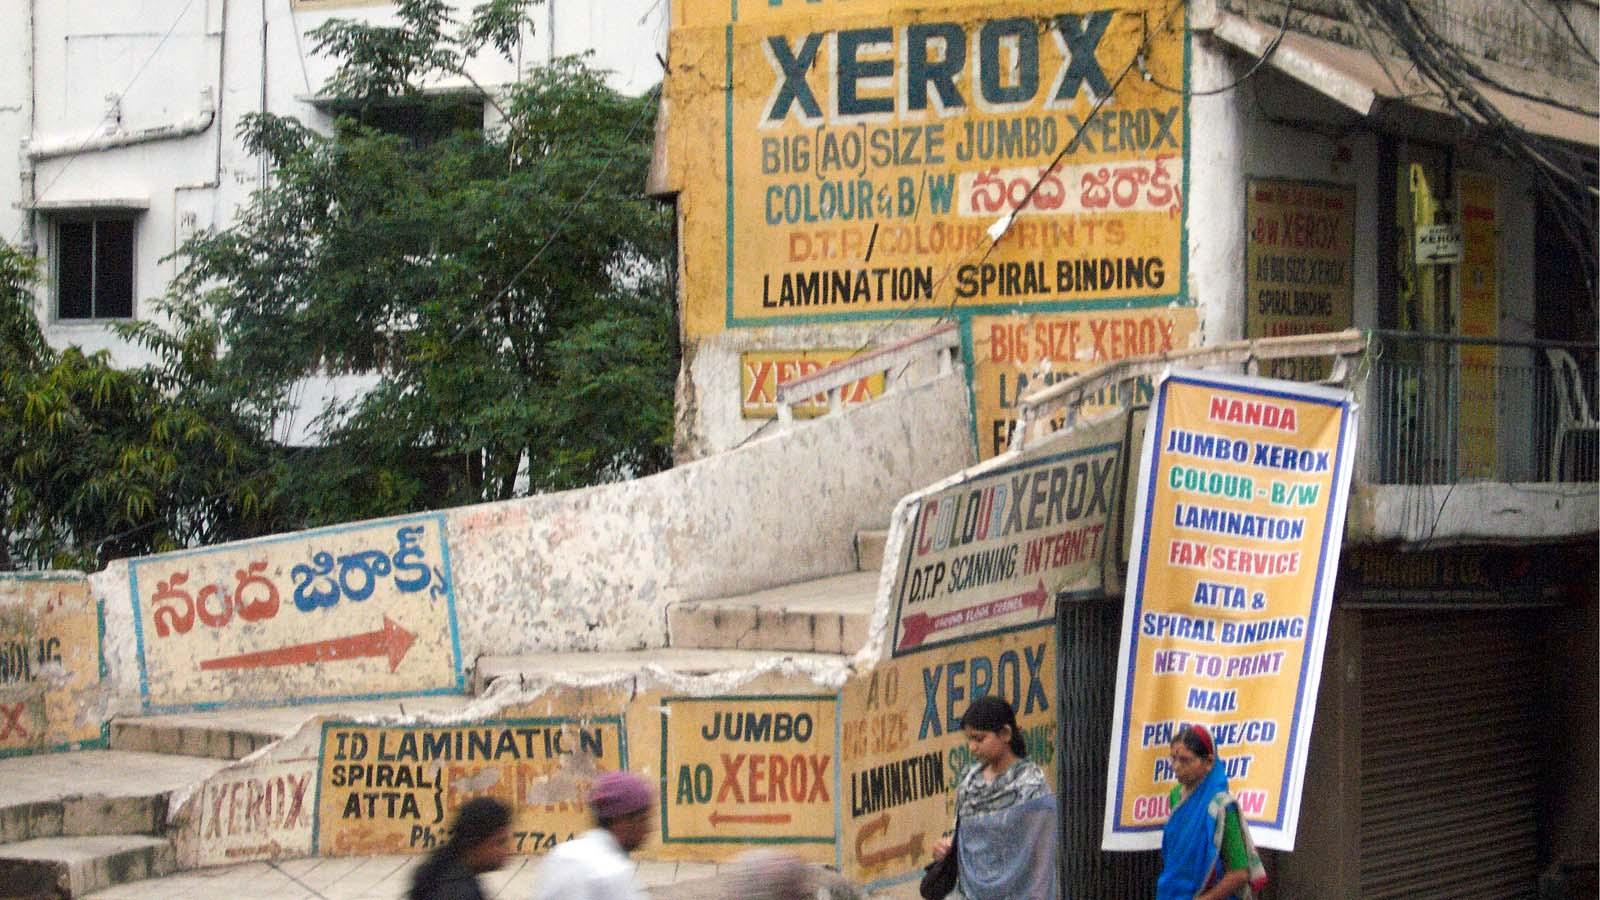 xerox-india-bruno-jehle-2012-lowres.jpg